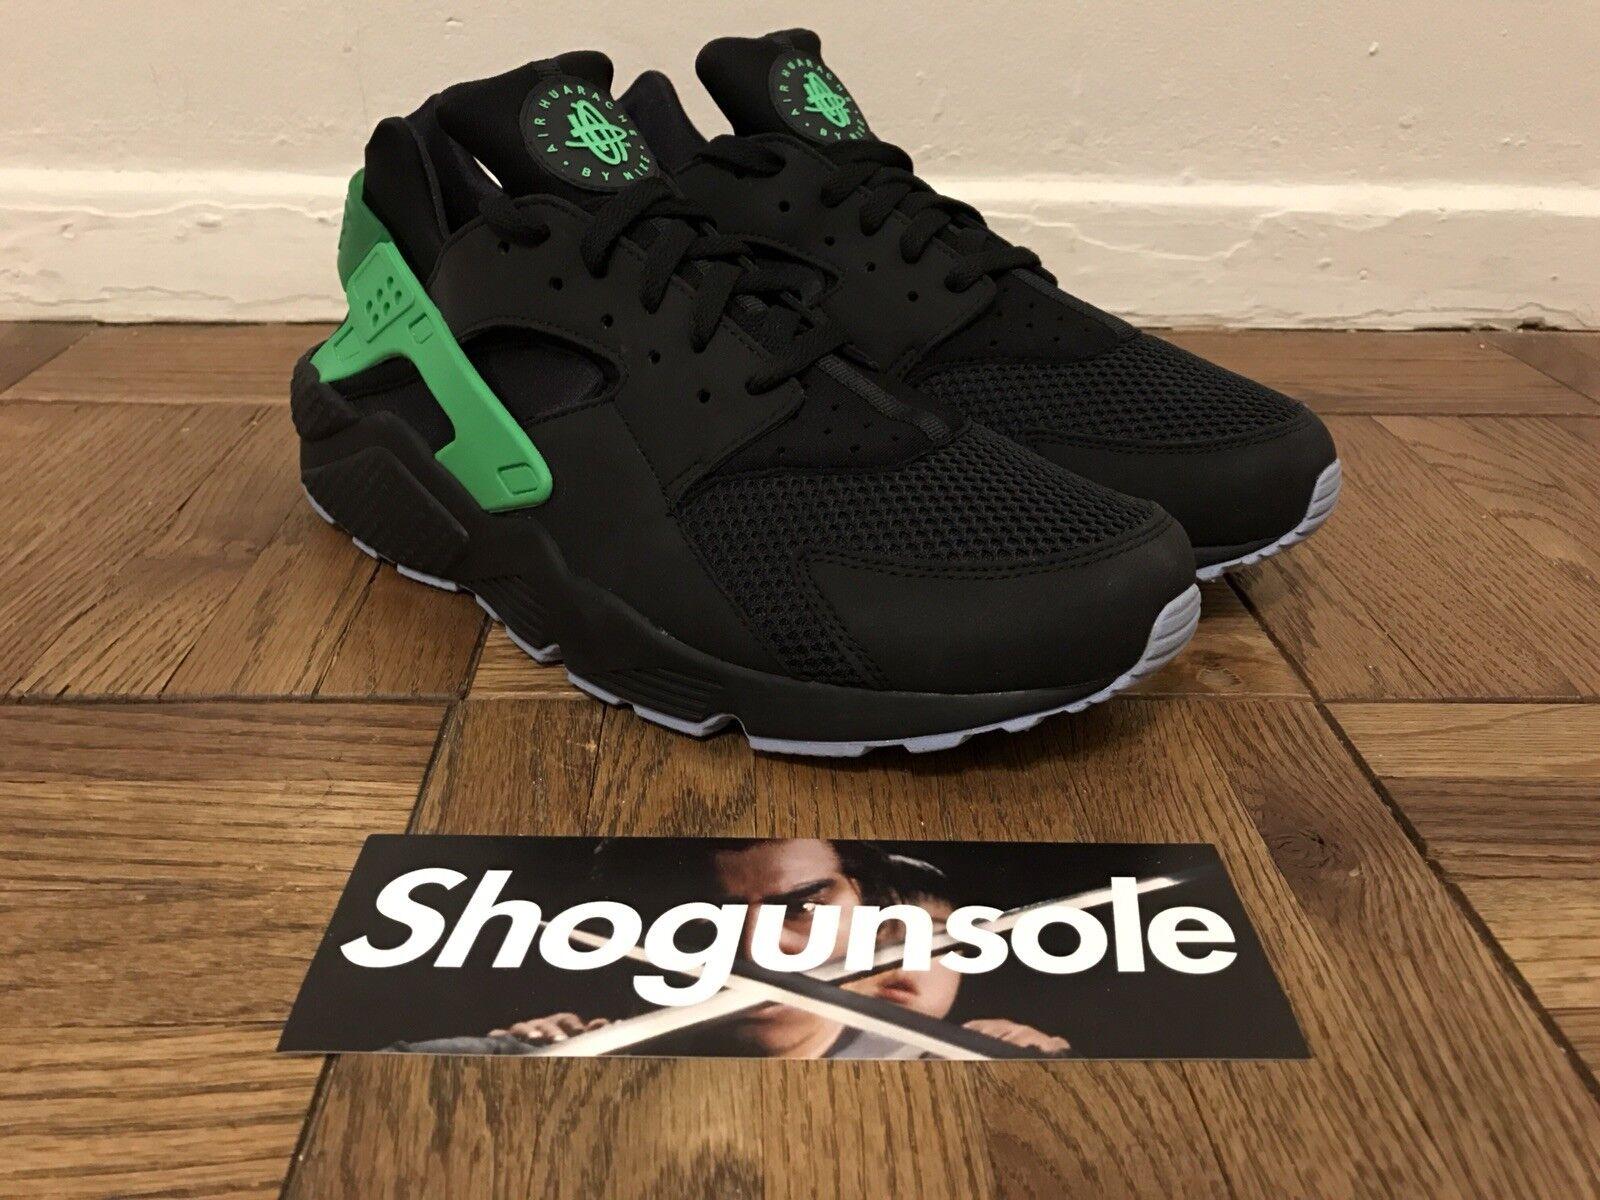 Nike Air huarache Run FB DS nosotros SZ Verde 12,5 Negro / Verde SZ Poison 705070-001 especial de tiempo limitado 016b71